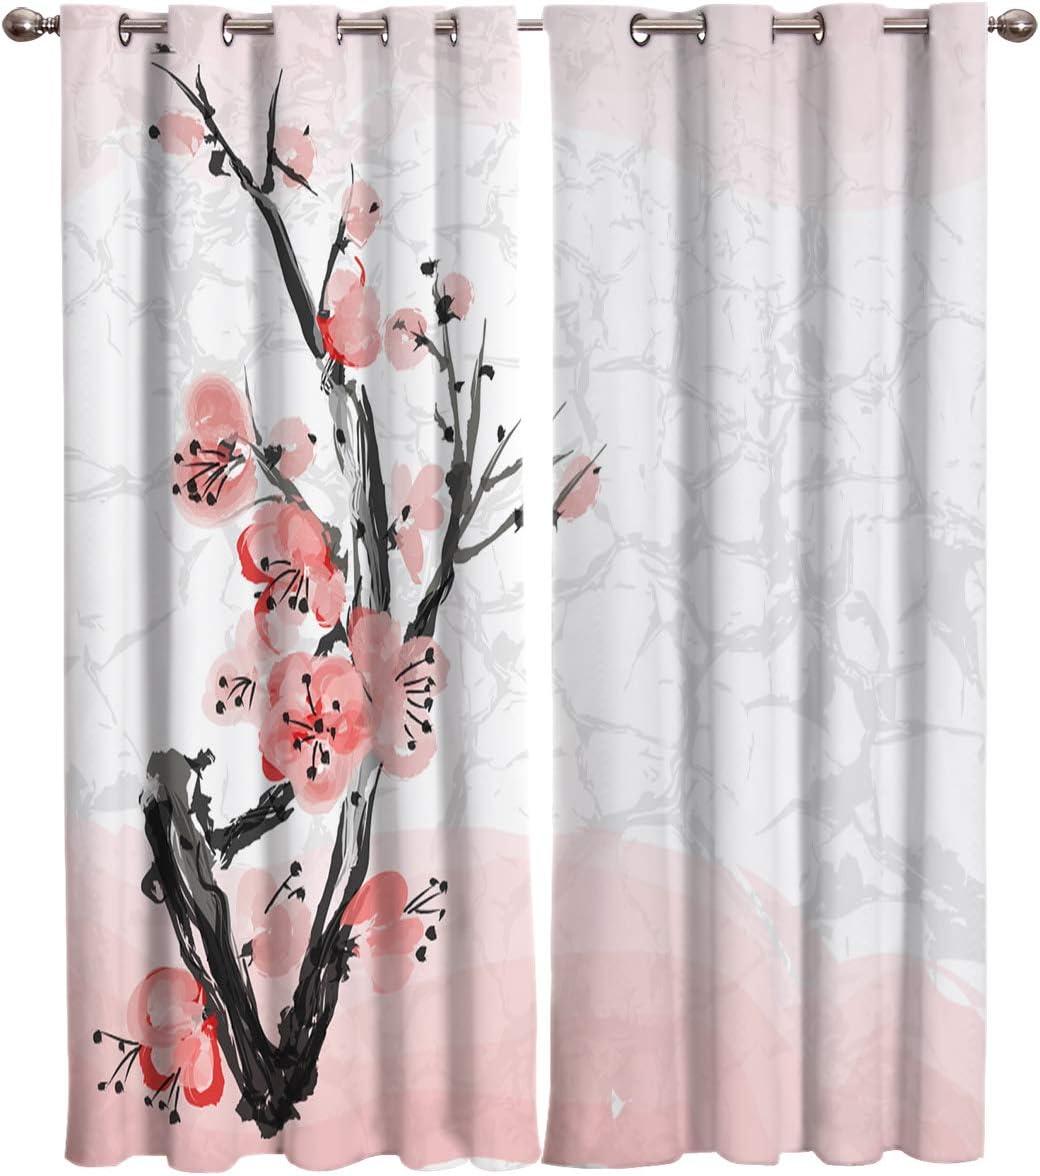 Window 永遠の定番モデル Curtain Japanese Cherry Blossom and Dra Home バーゲンセール Branch Decor